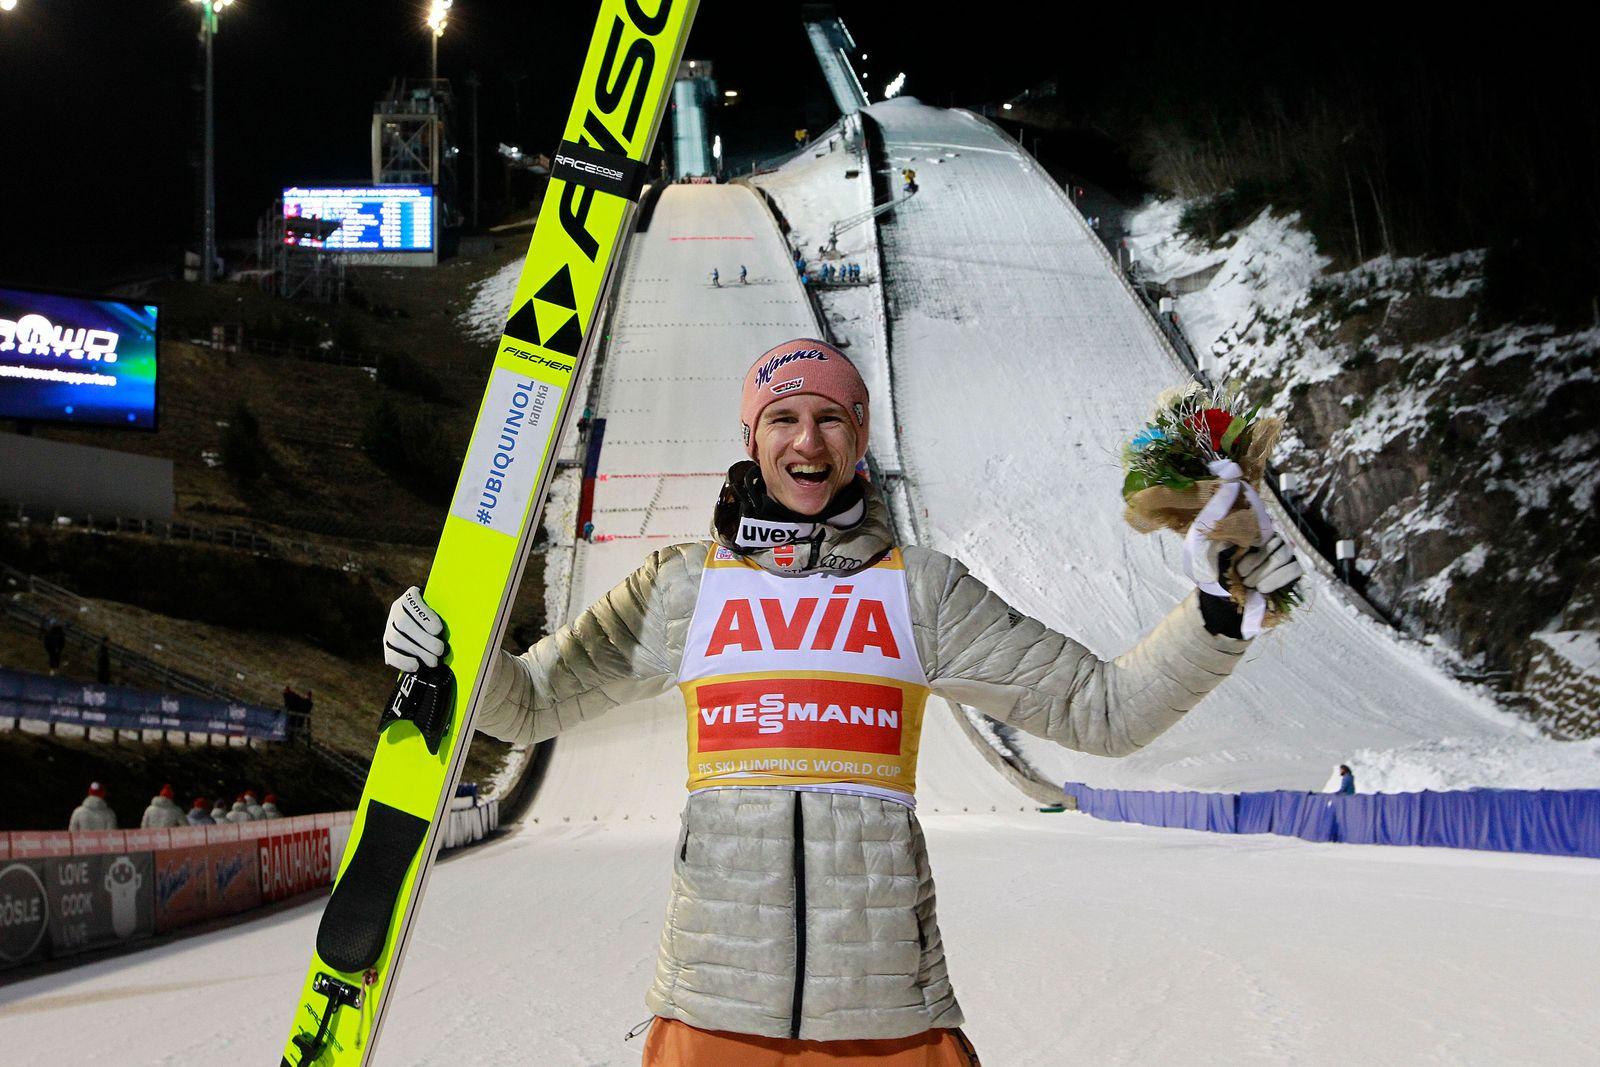 Ski Jumping World Cup in Val di Fiemme, Predazzo, Italy - 12 Jan 2020